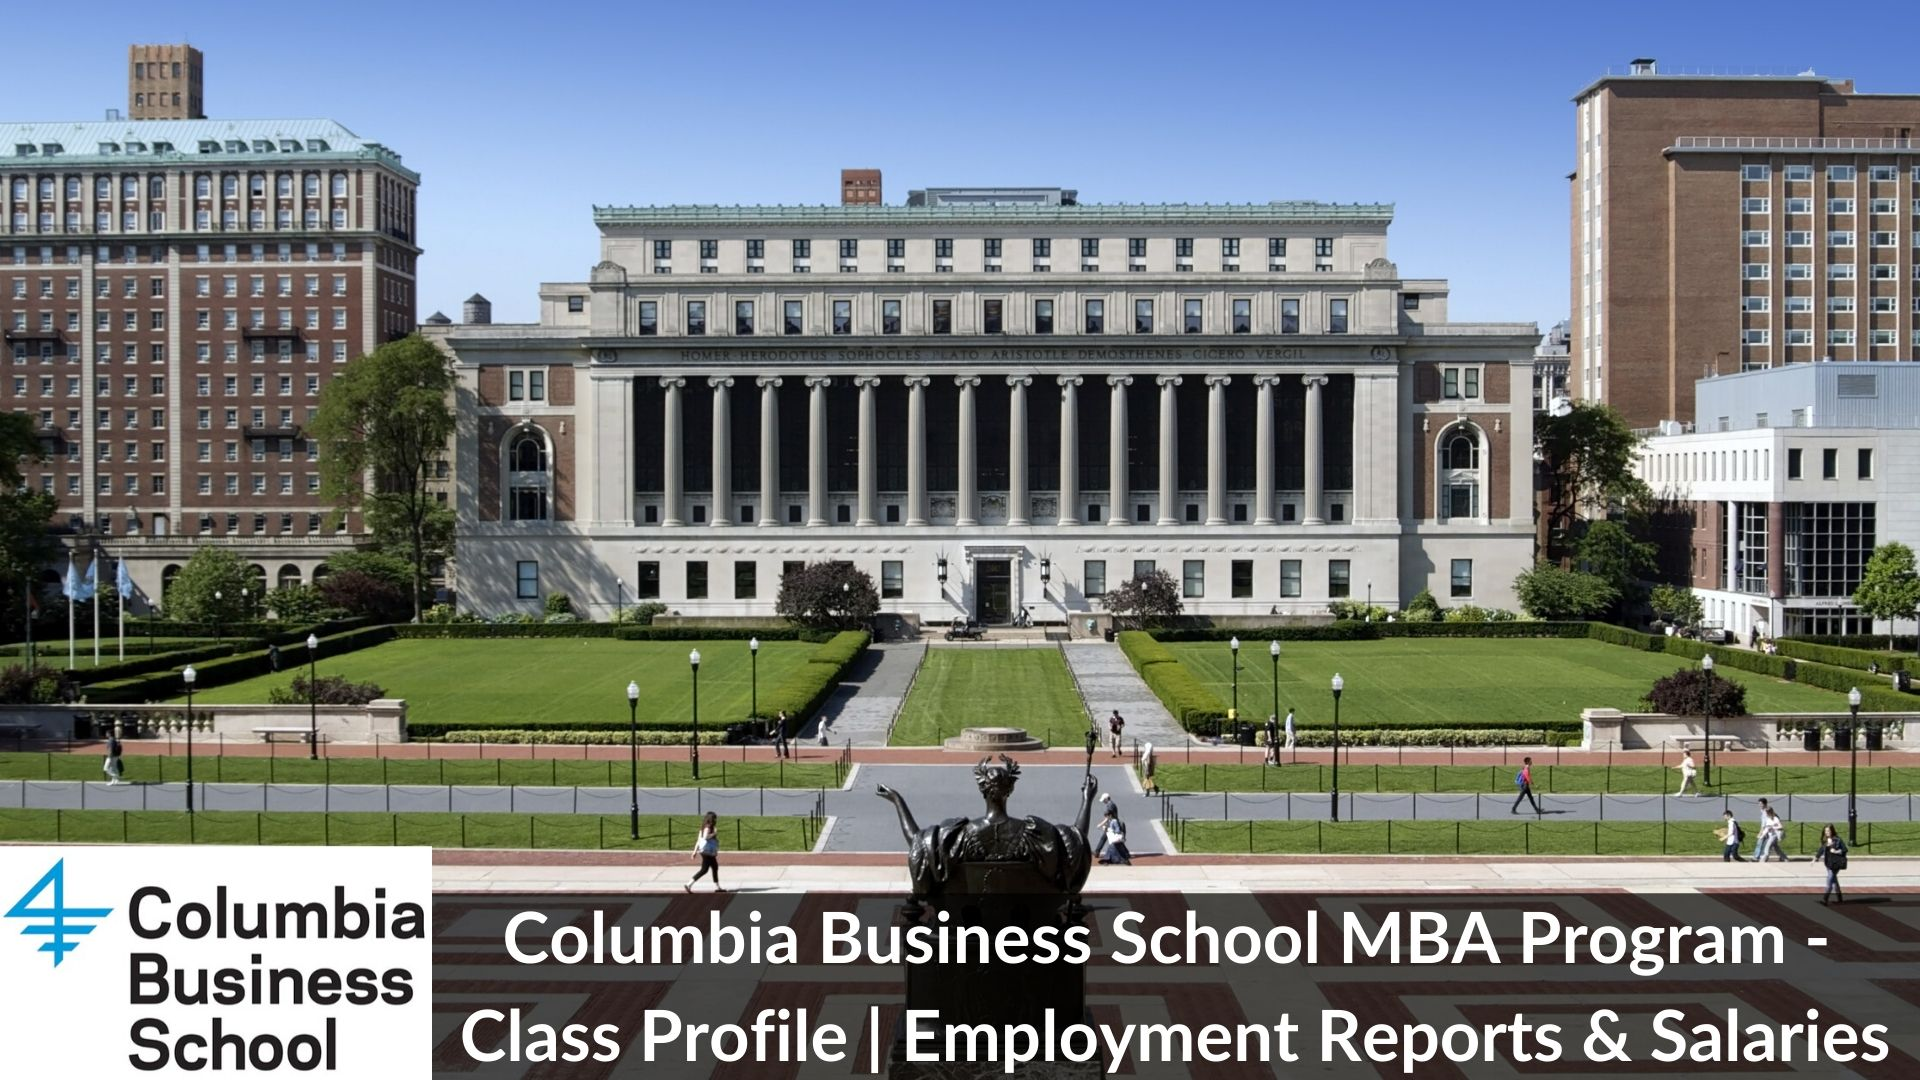 Columbia Business School MBA Program - Class Profile _ Employment Reports & Salaries